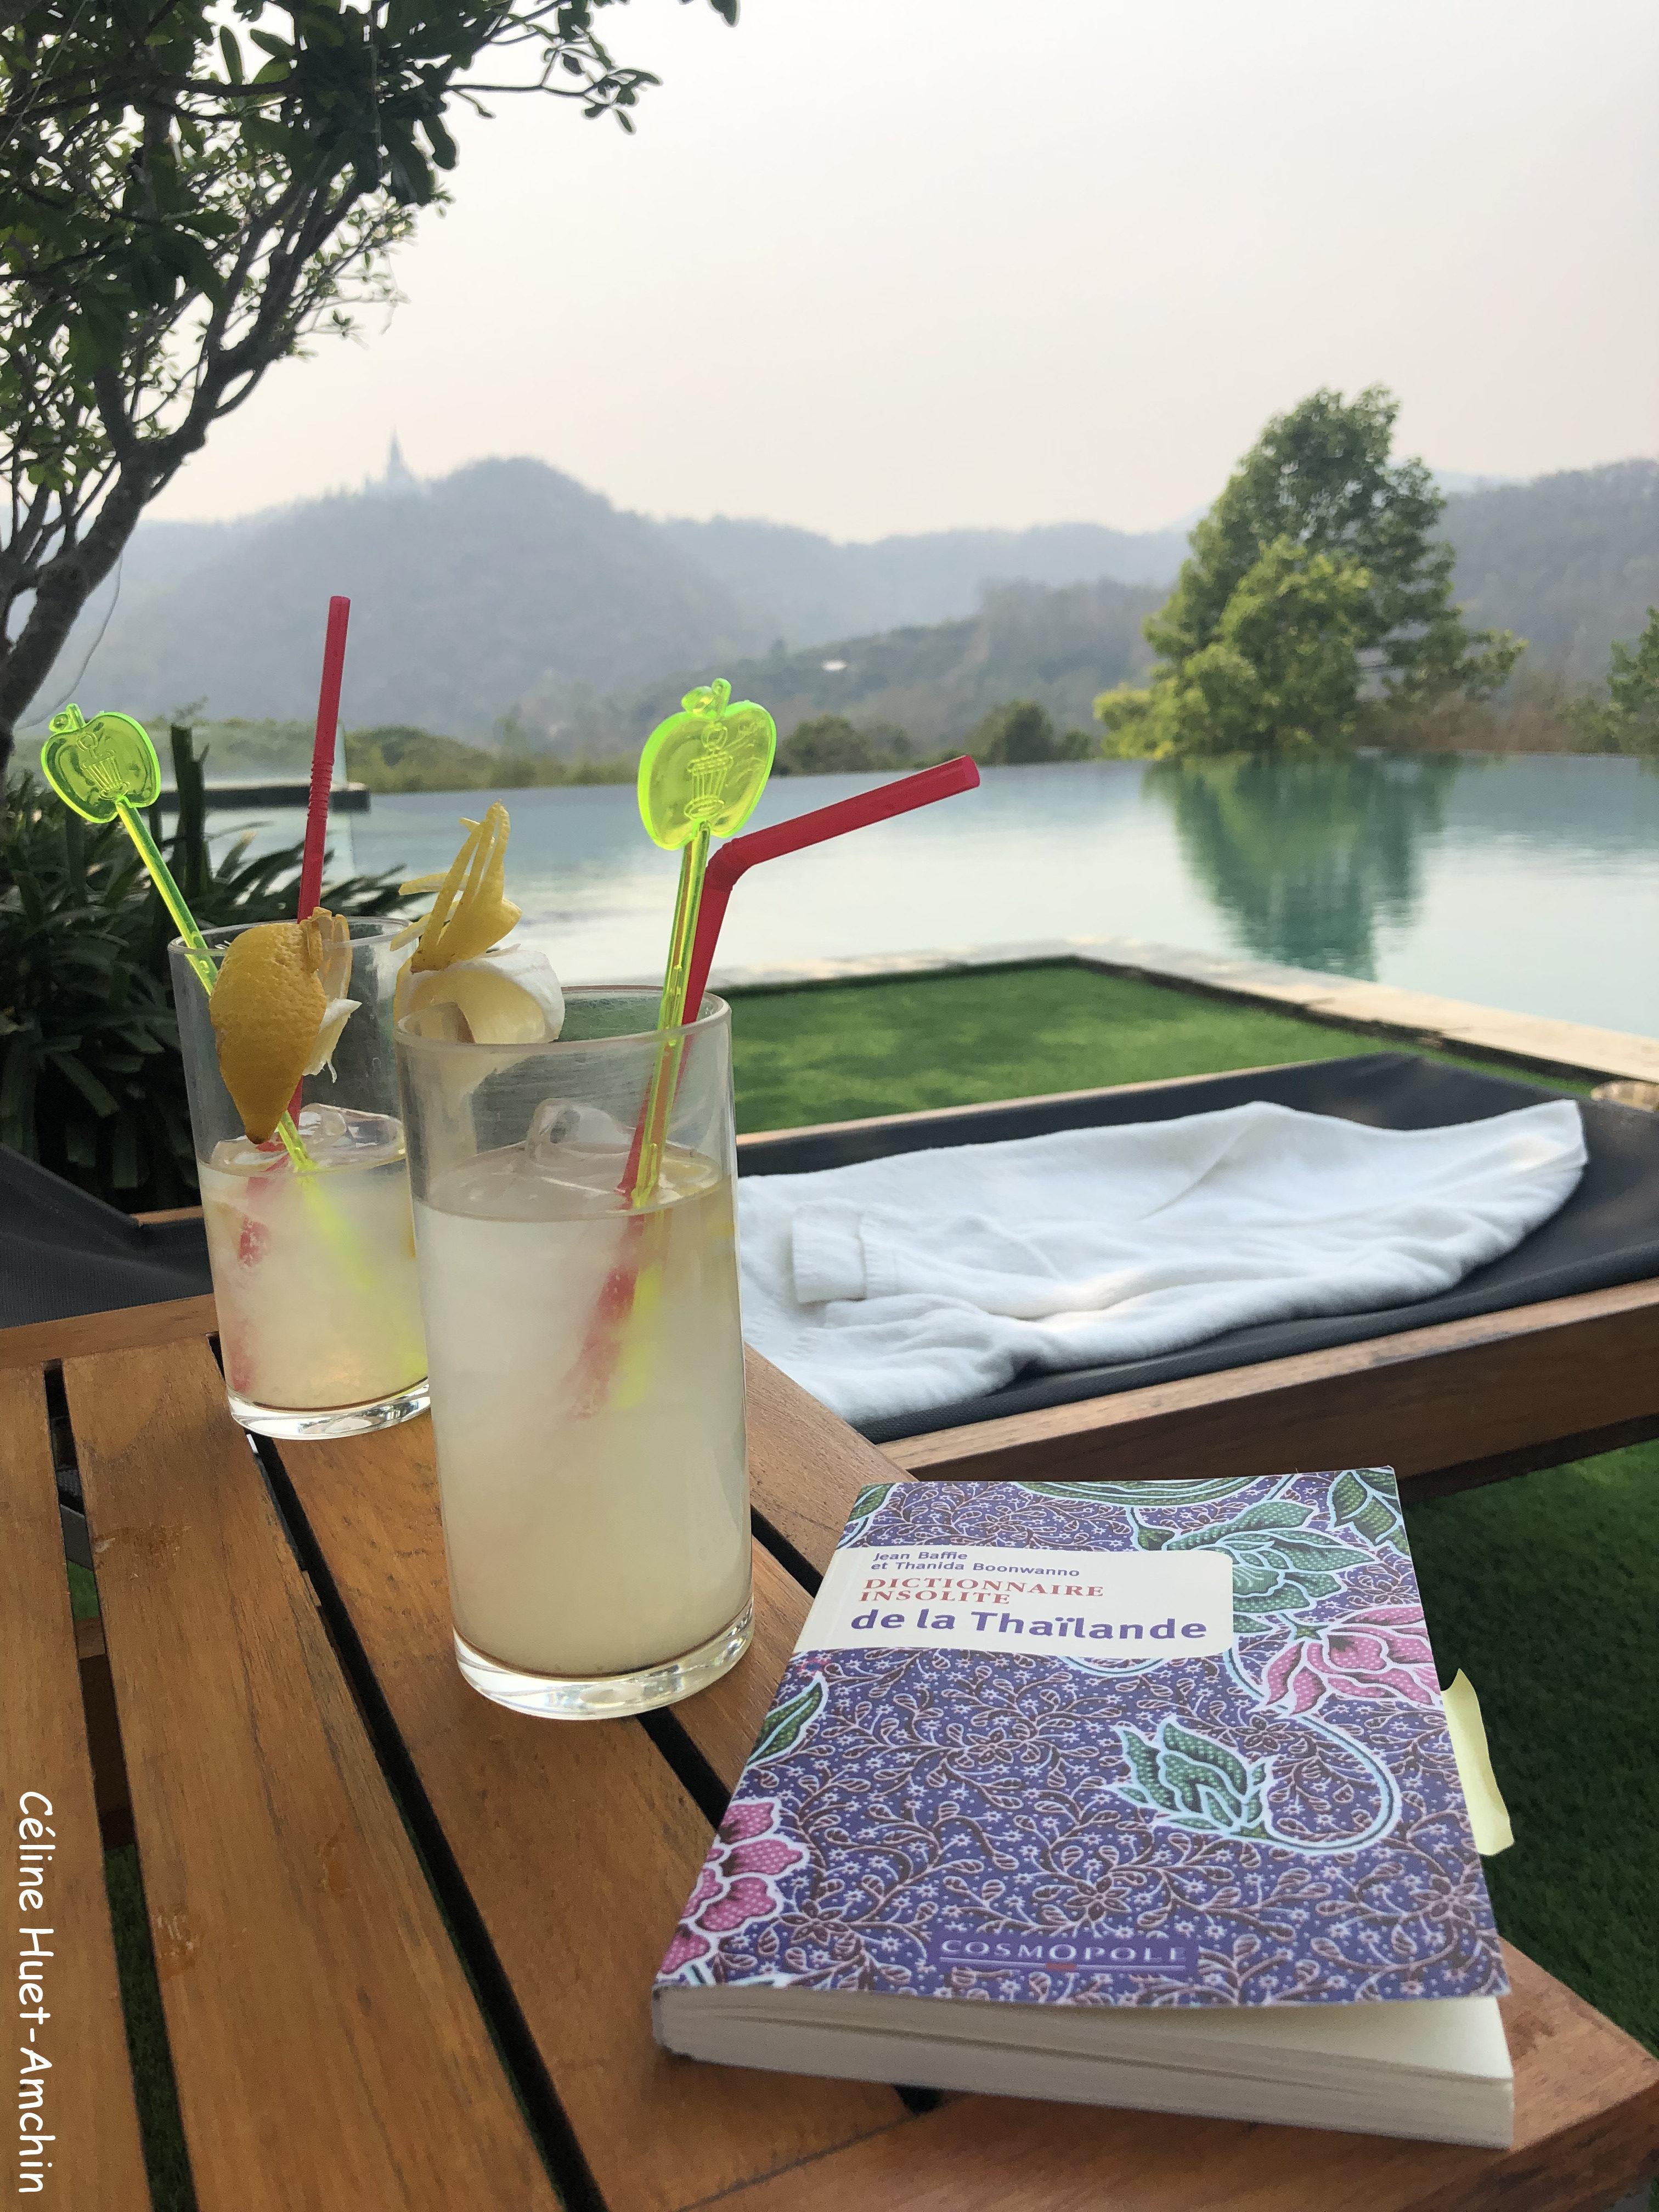 Dictionnaire insolite de la Thaïlande Editions Cosmopole Hôtel Veranda High Resort Chiang Mai Hang Dong Thaïlande Asie